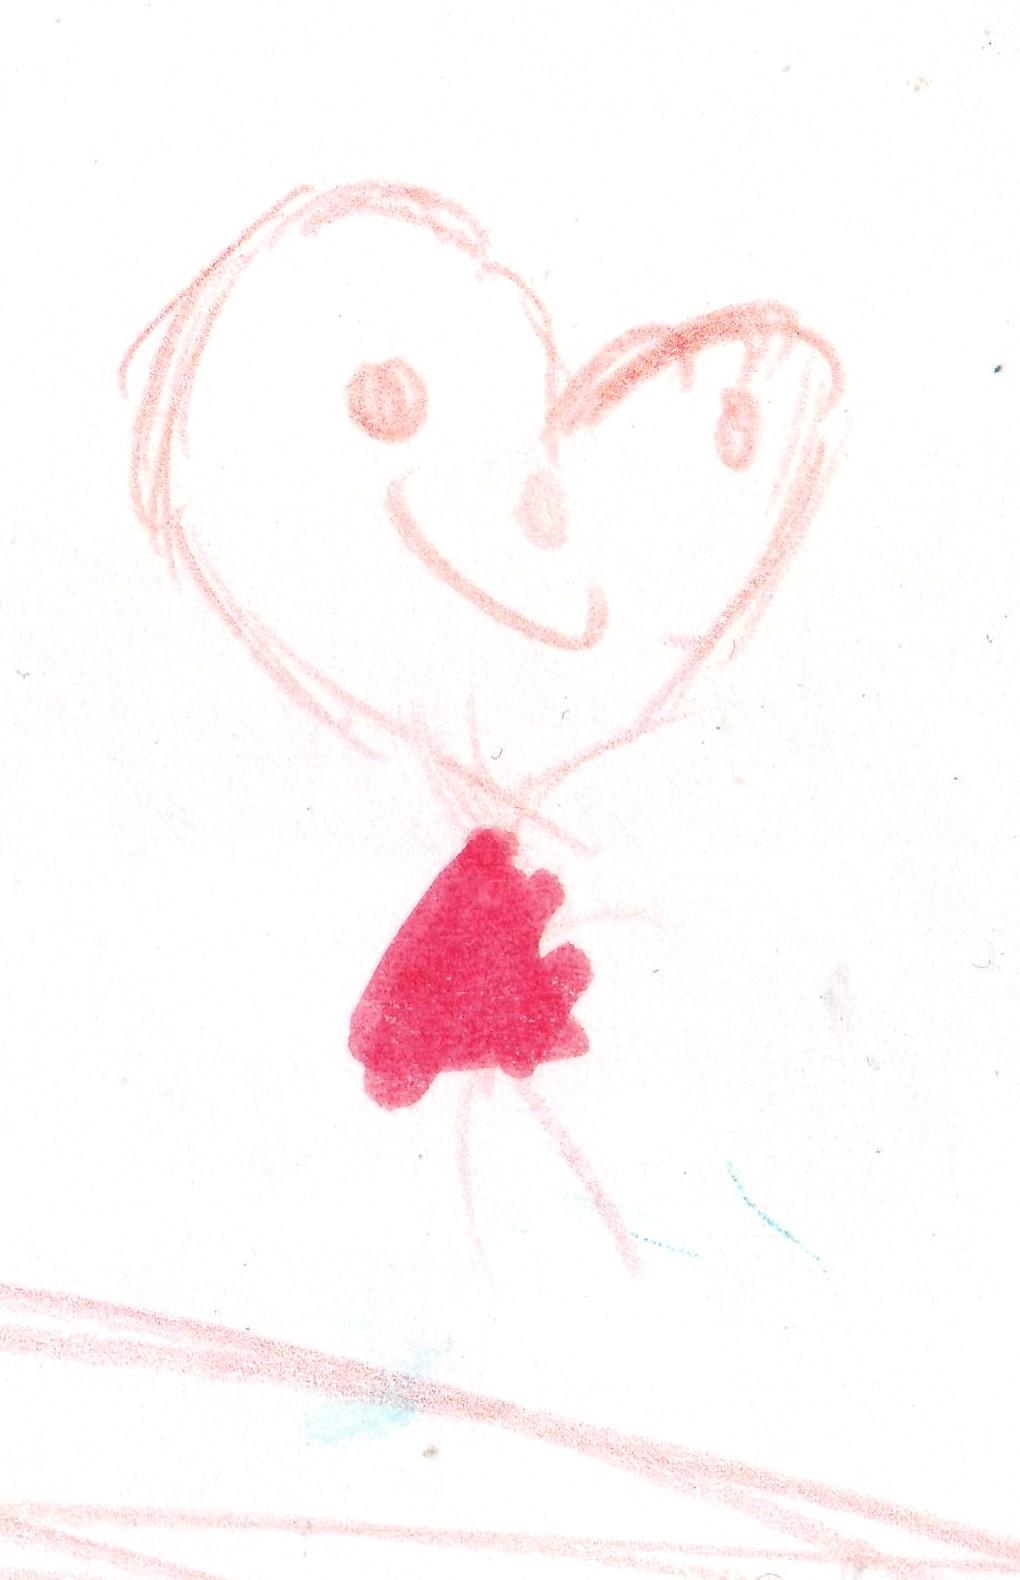 heartman 24.6.2010